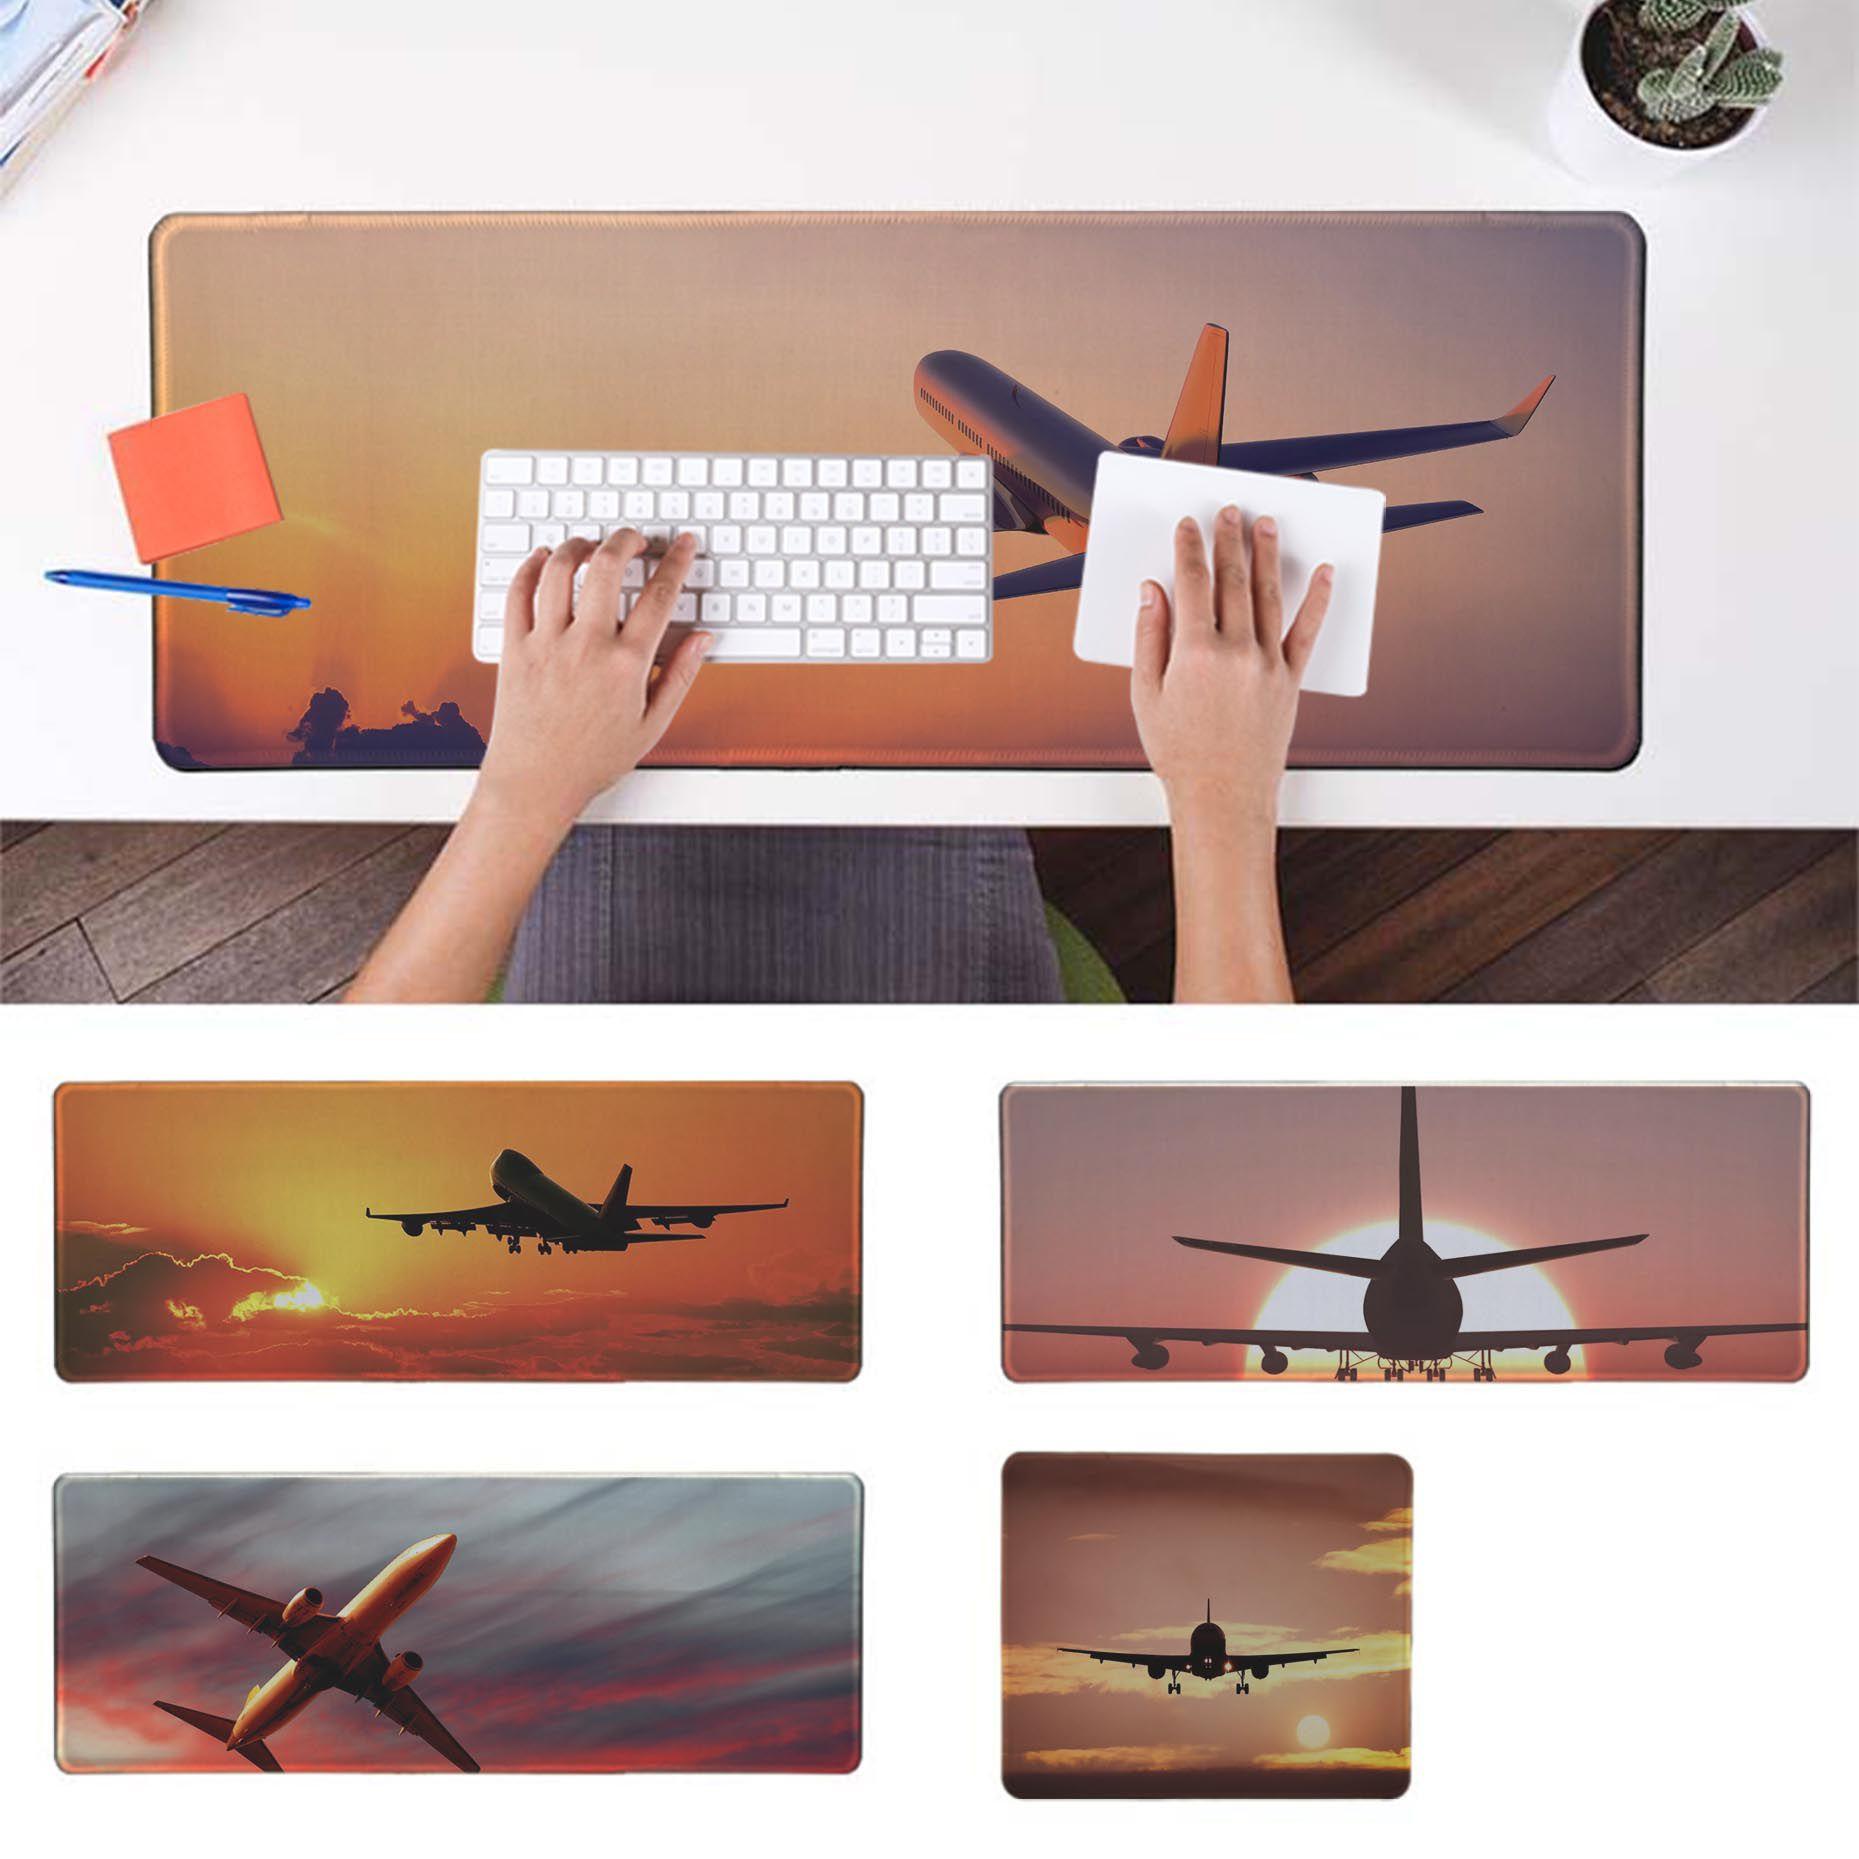 Maiya 2019 New Plane Airplane Flying At Sunset Natural Rubber Gaming Mousepad Desk Mat Rubber PC Computer Gaming Mousepad